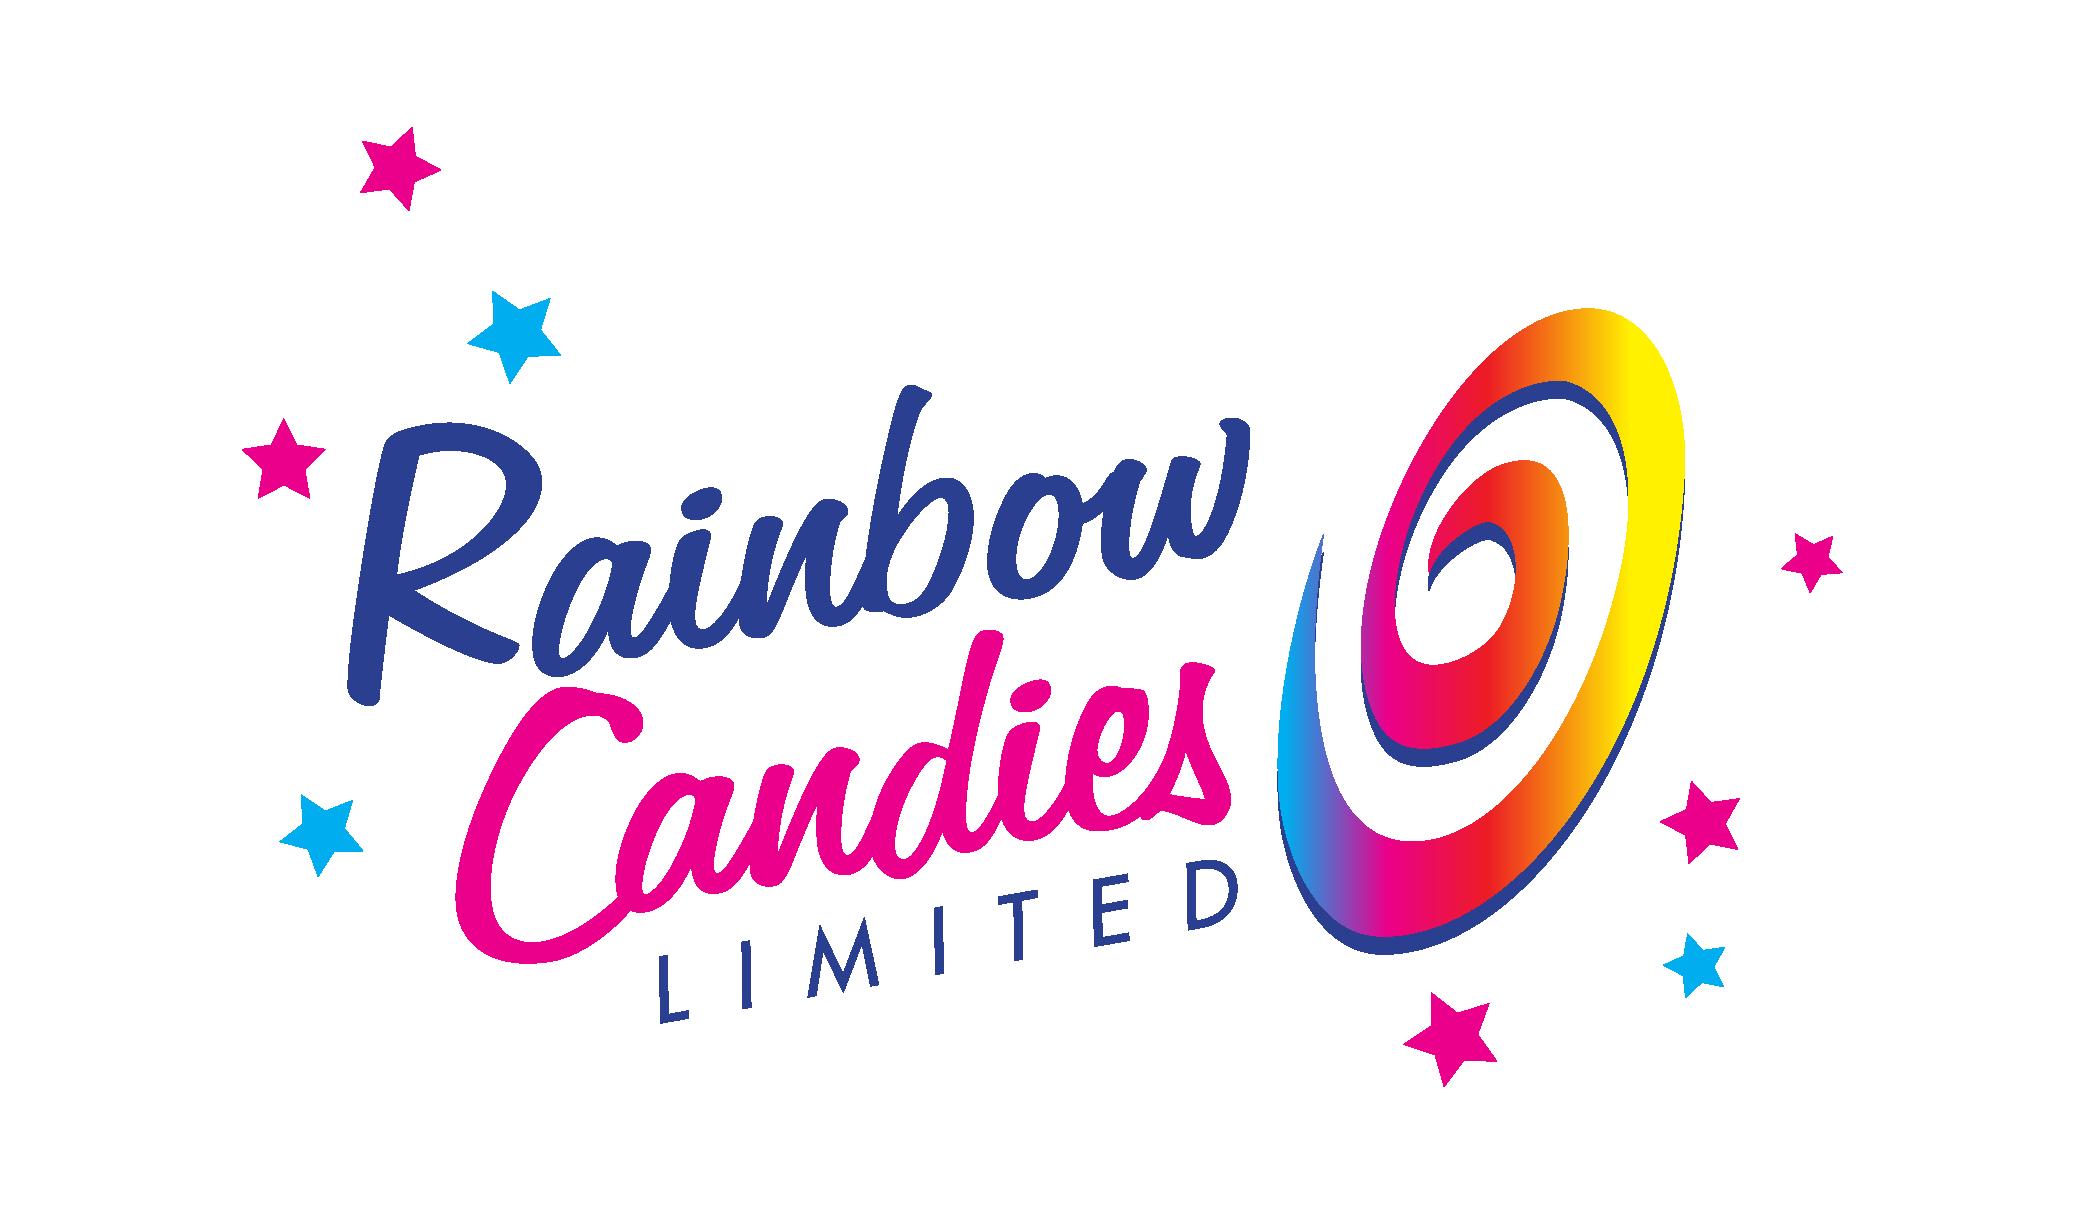 RainbowCandies.co.uk